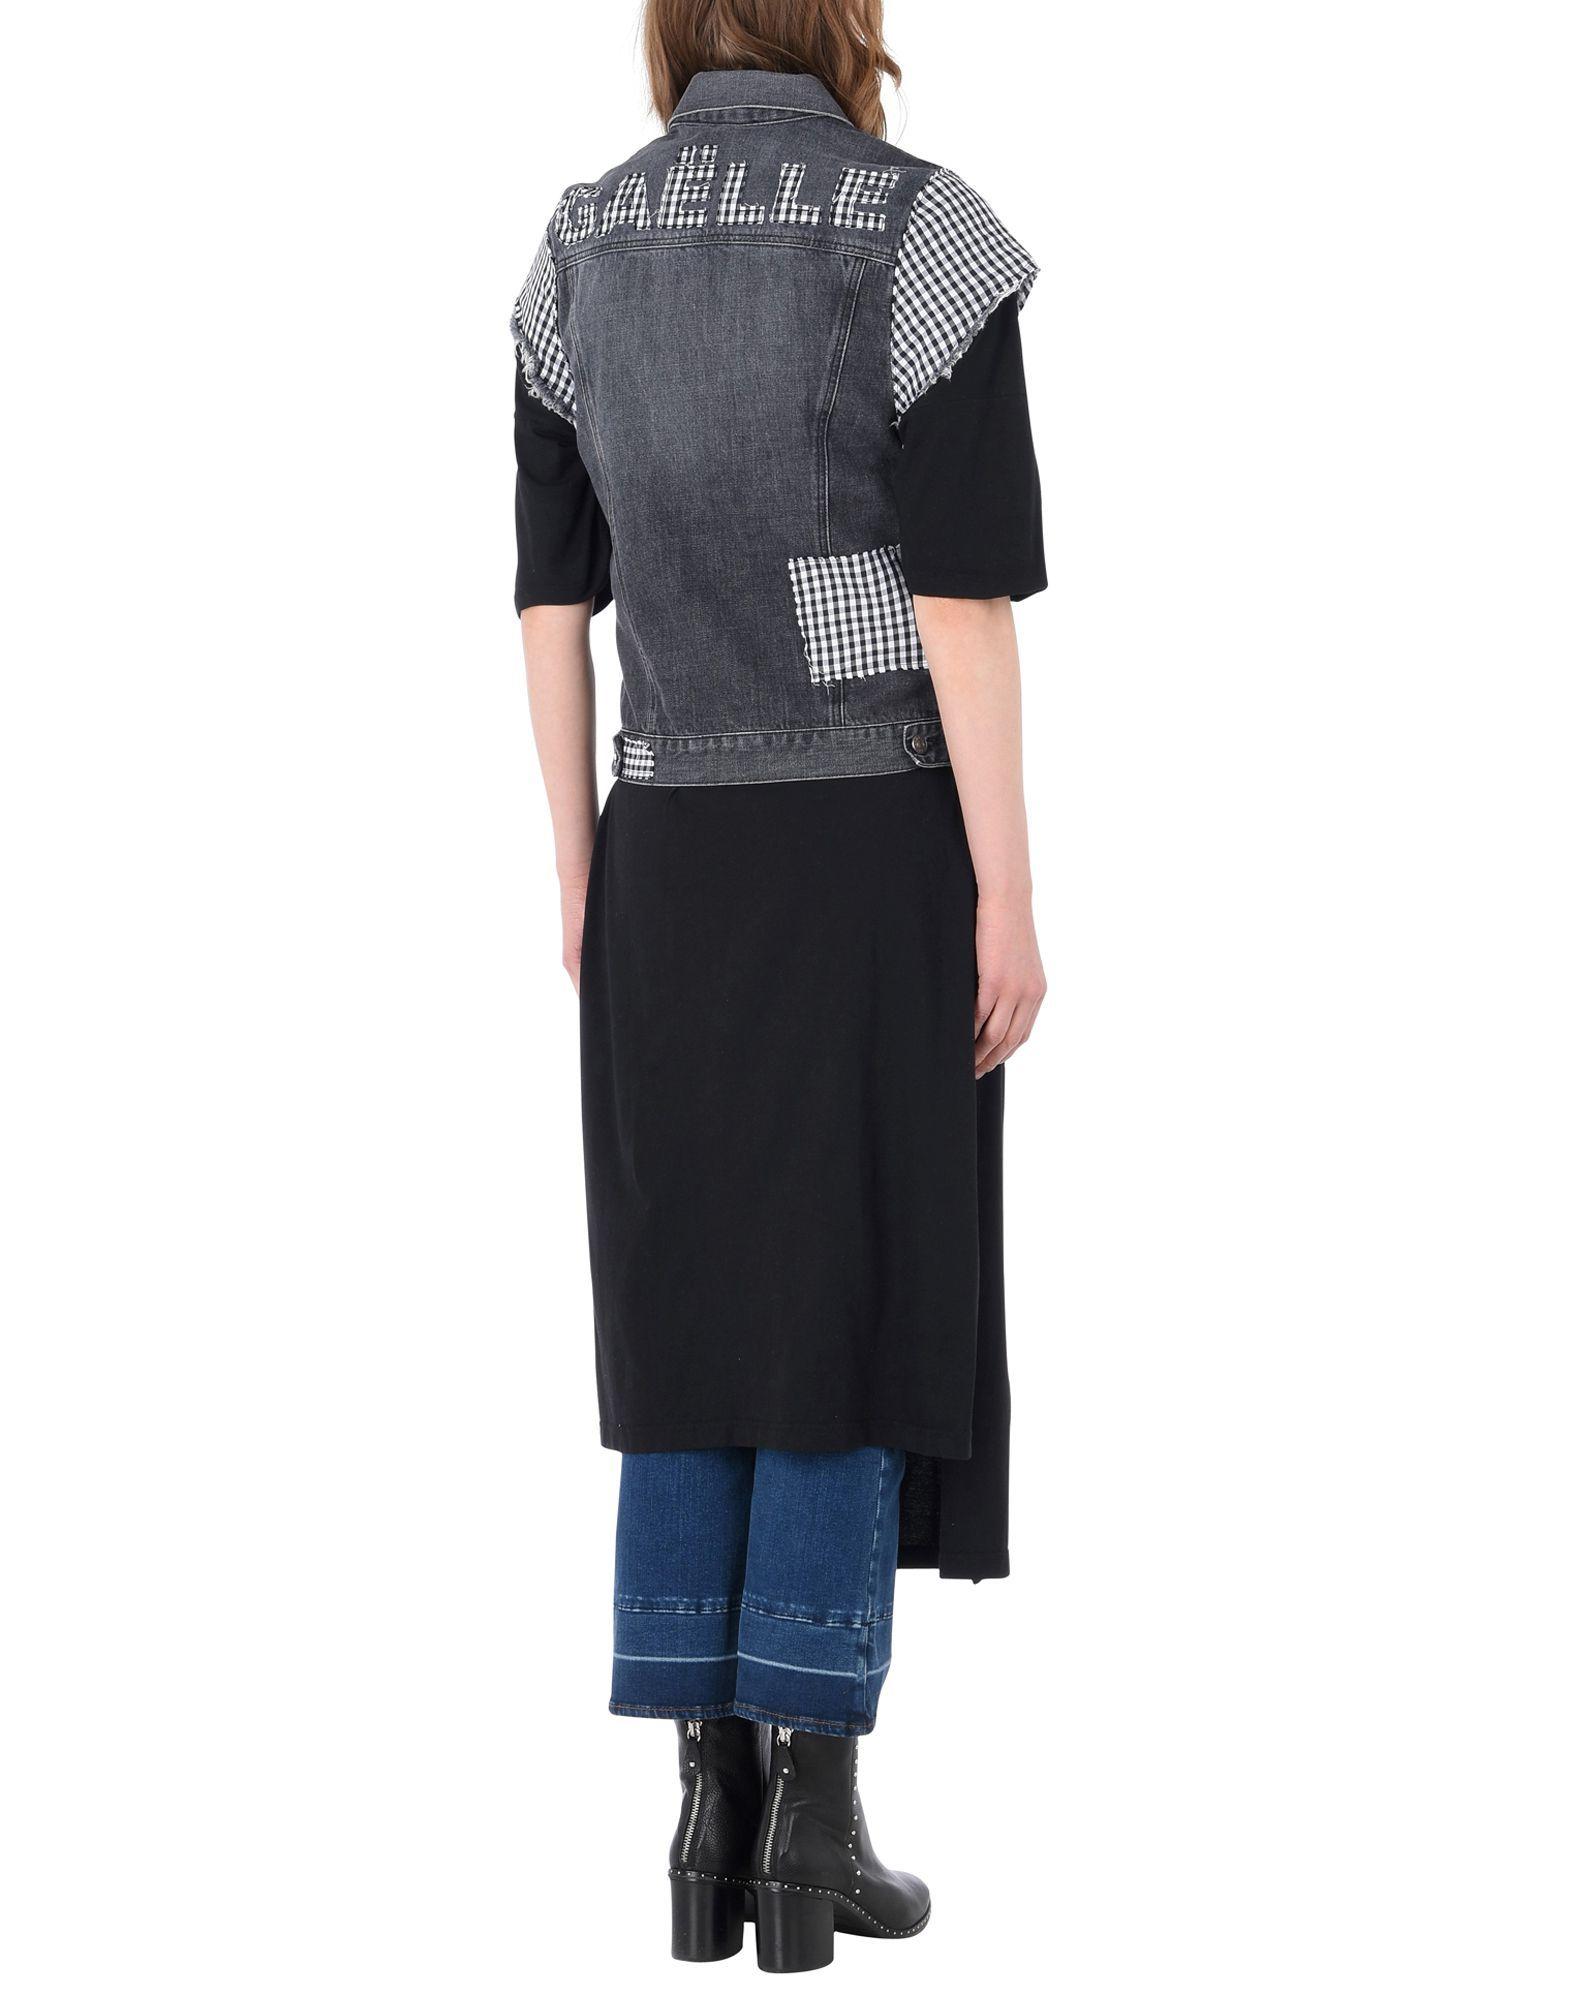 Denim Ga�Lle Paris Black Women's Cotton